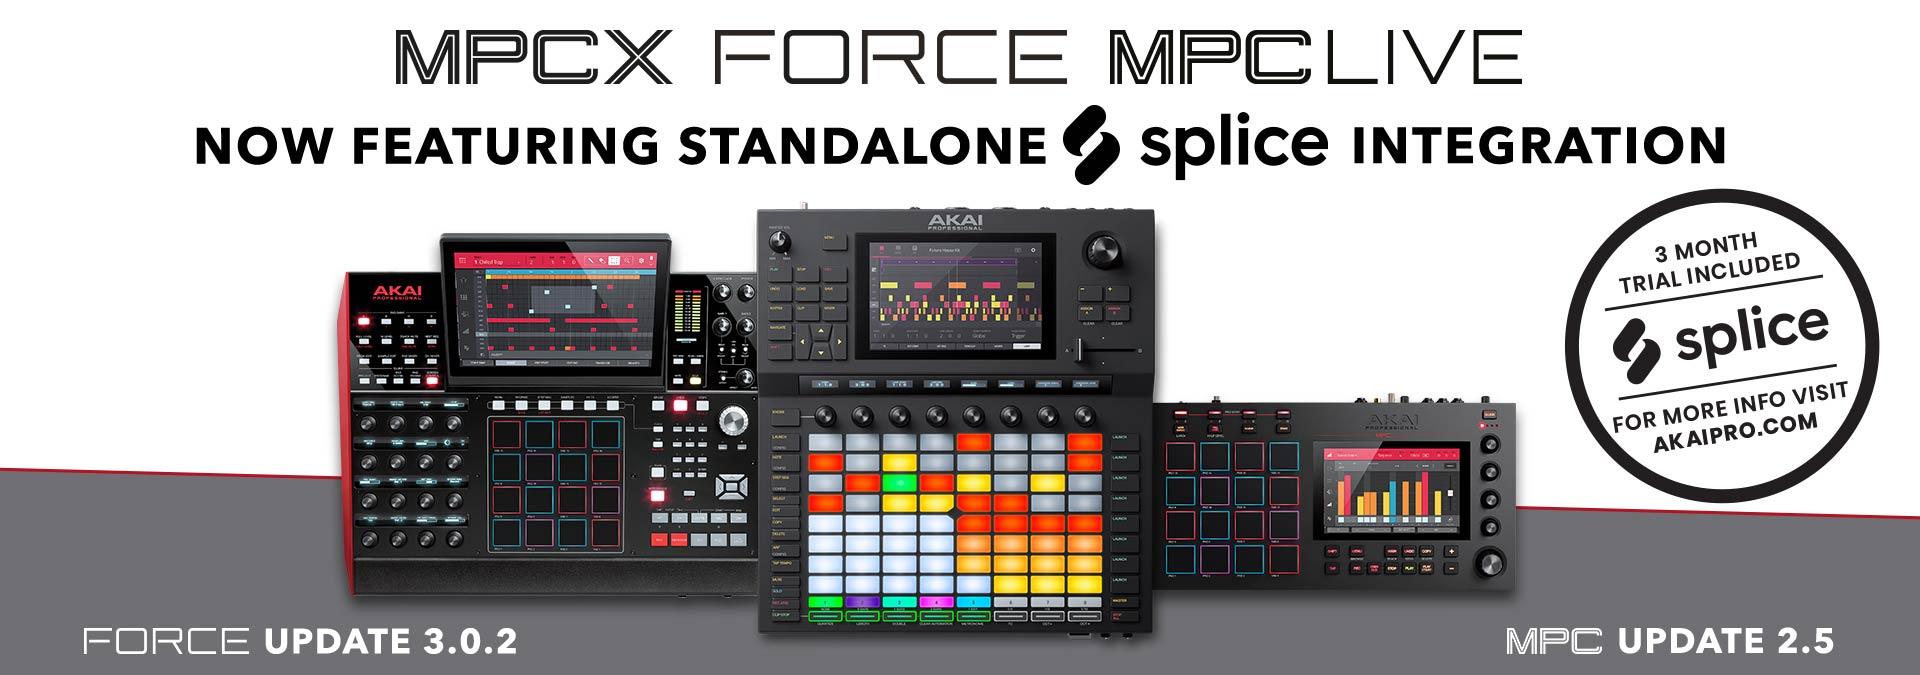 AKAI PROFESSIONAL Announces Splice Integration In Force, MPC Live